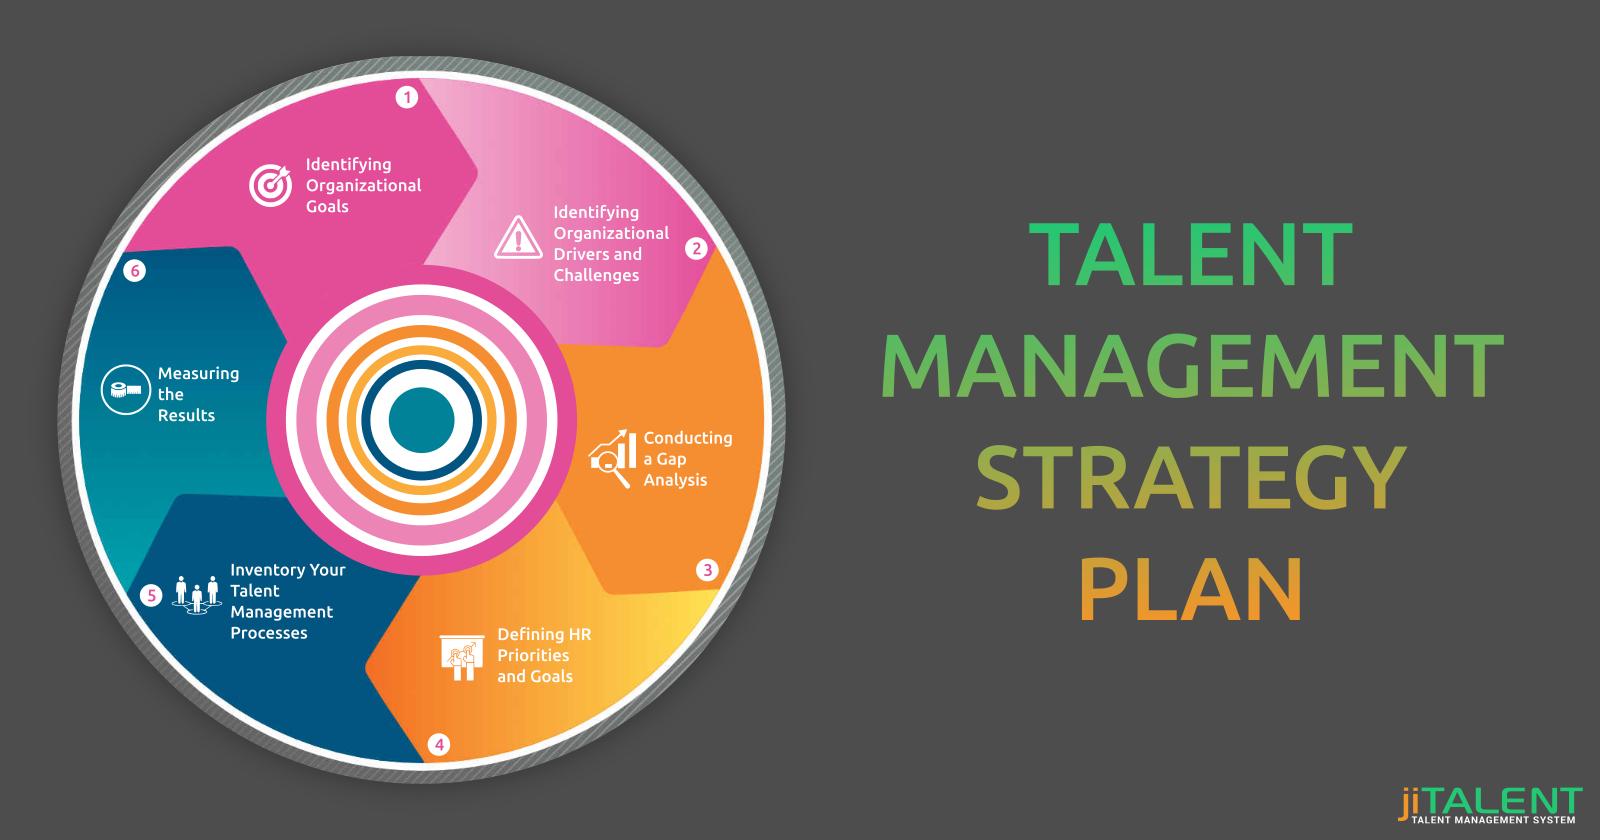 Developing an Effective Talent Management Strategy Plan